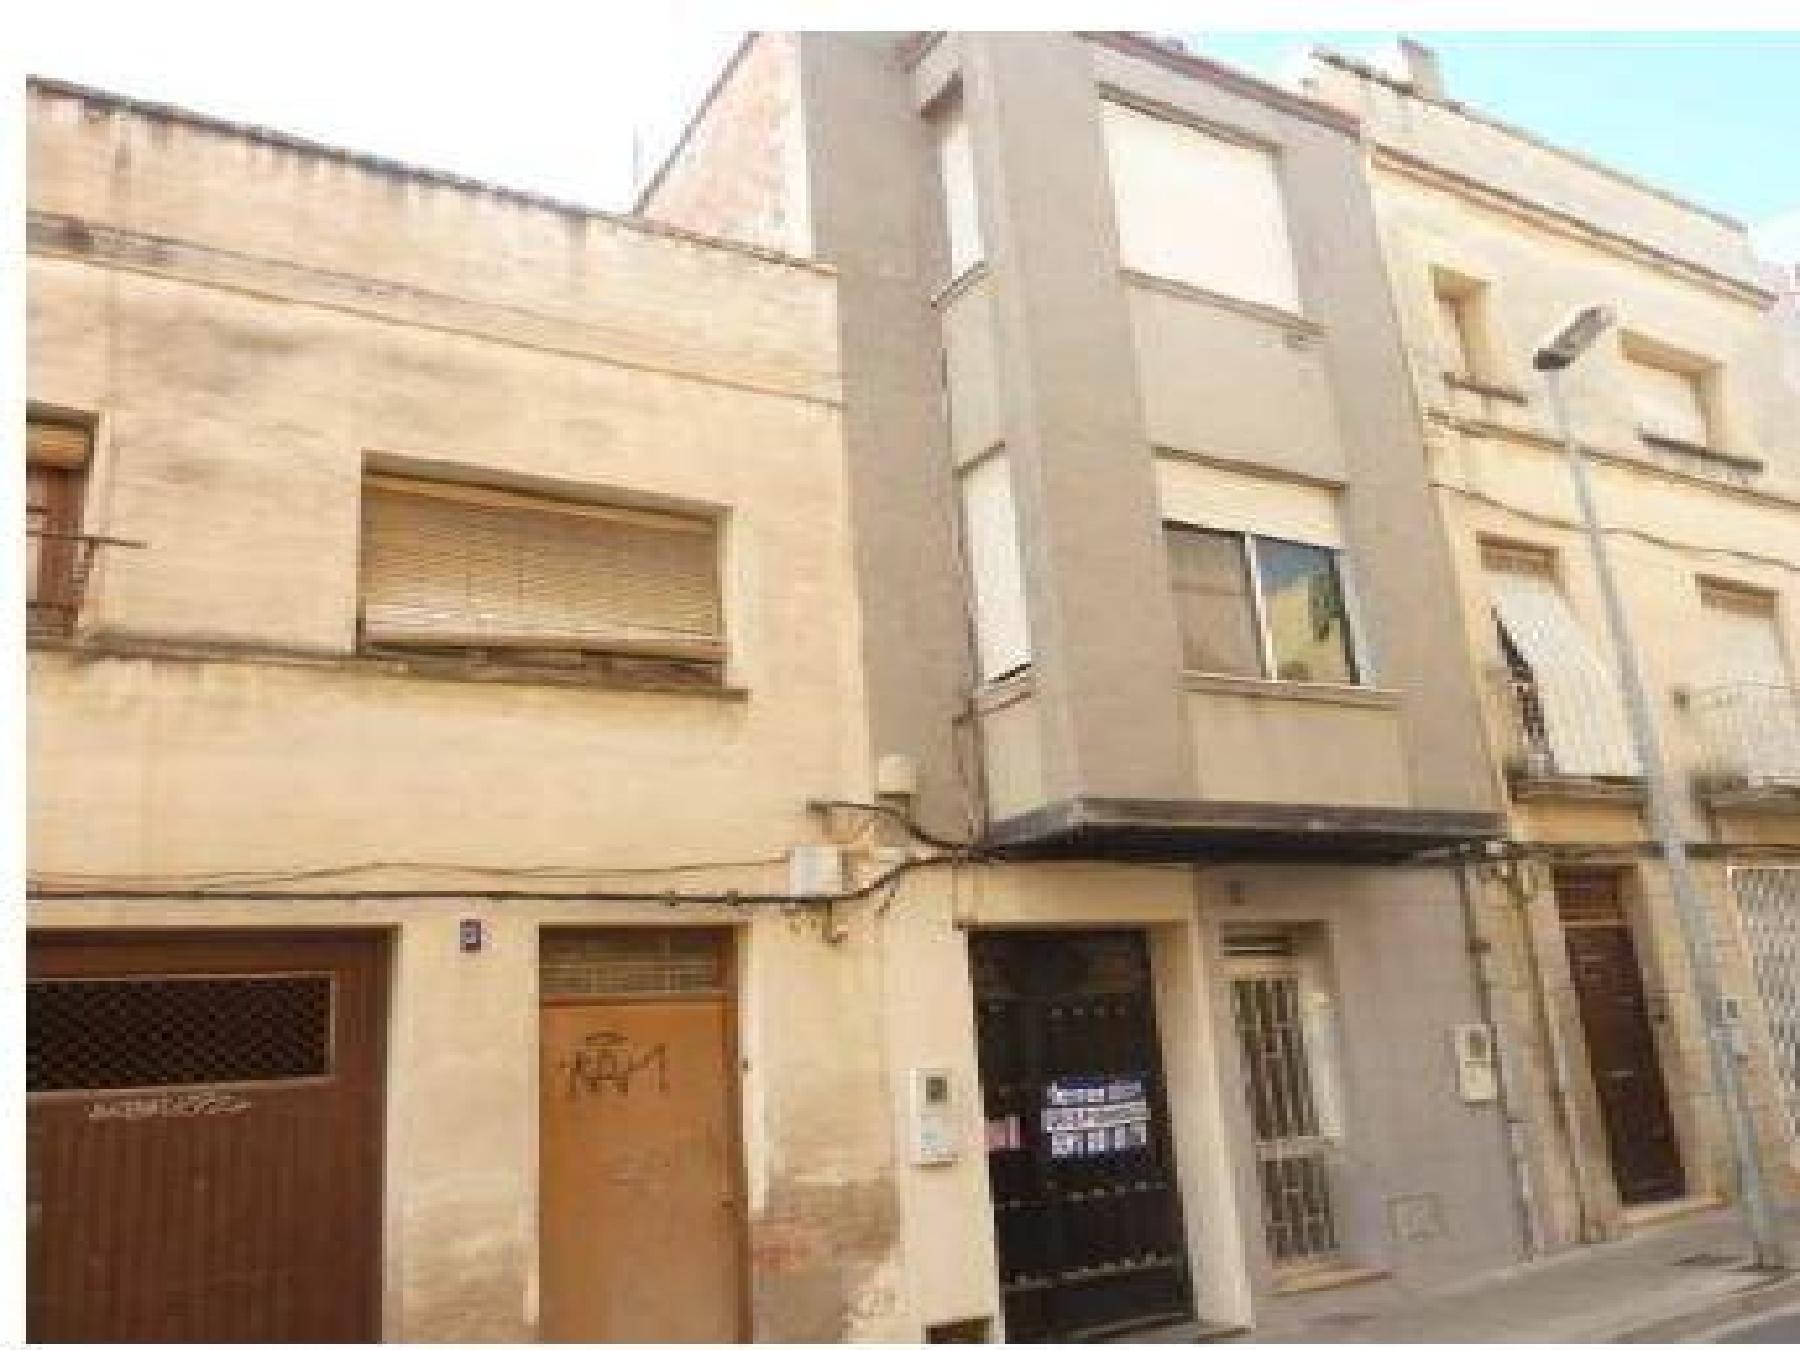 Local en venta en Vinaròs, Castellón, Calle Carrero, 19.500 €, 52 m2